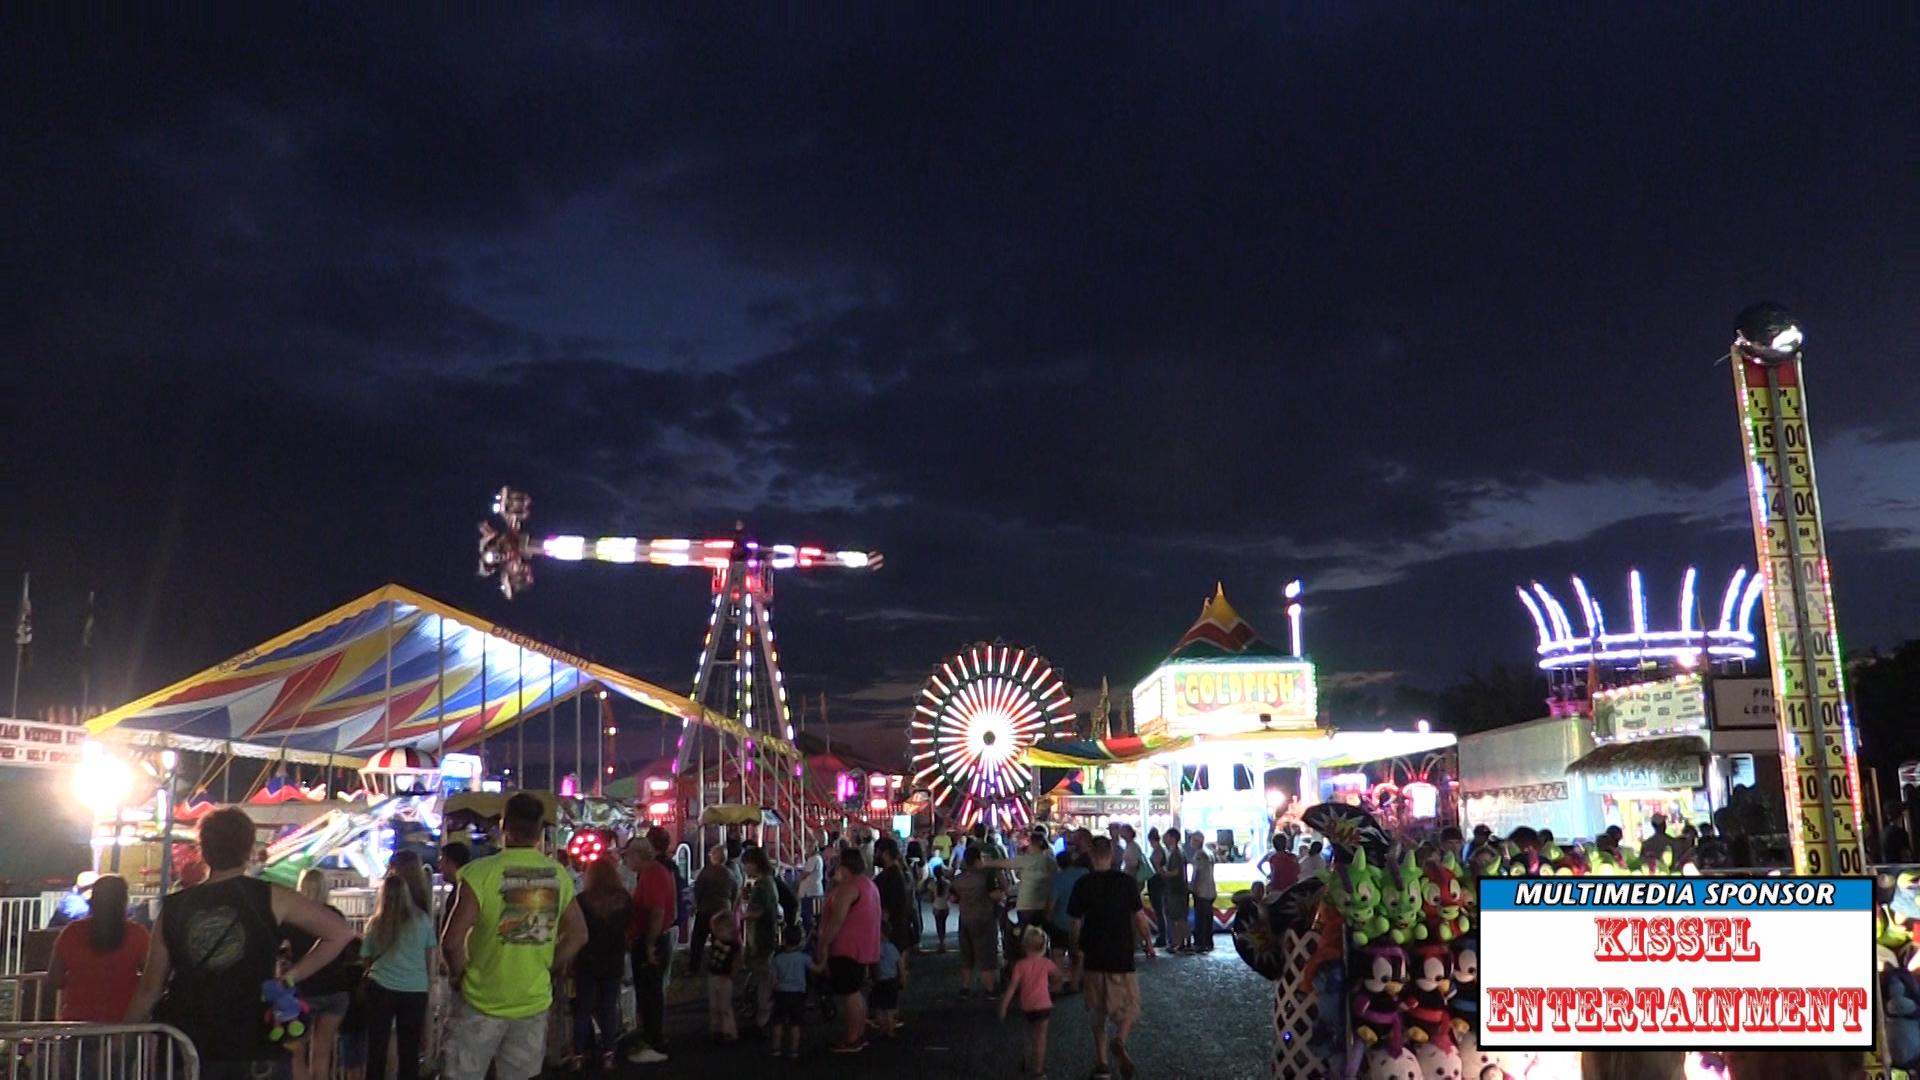 VIDEO: Kissel Entertainment @ Warren County Fair